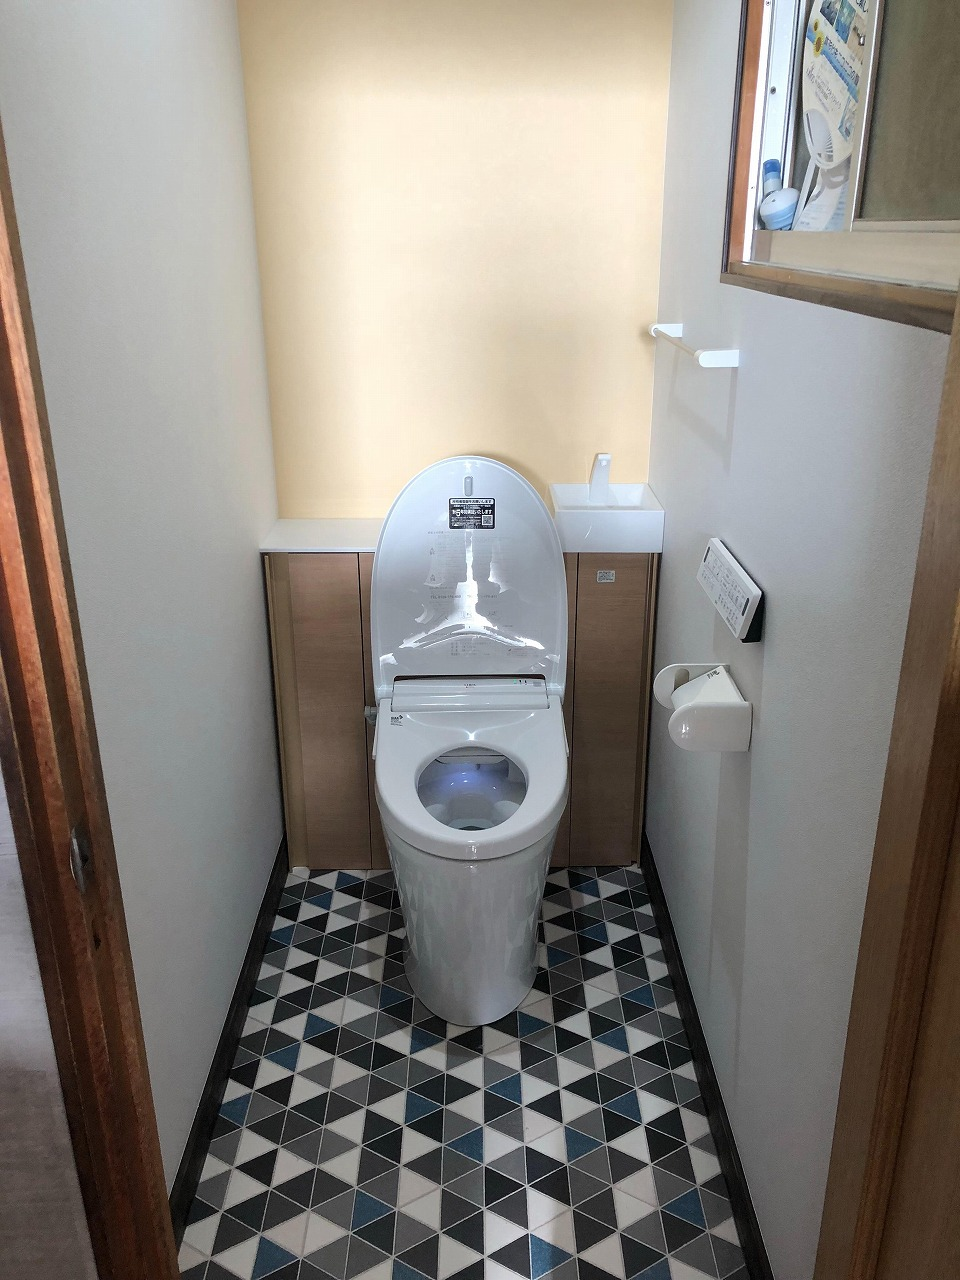 【トイレ改修工事】常滑市 M様邸 2019年1月8日